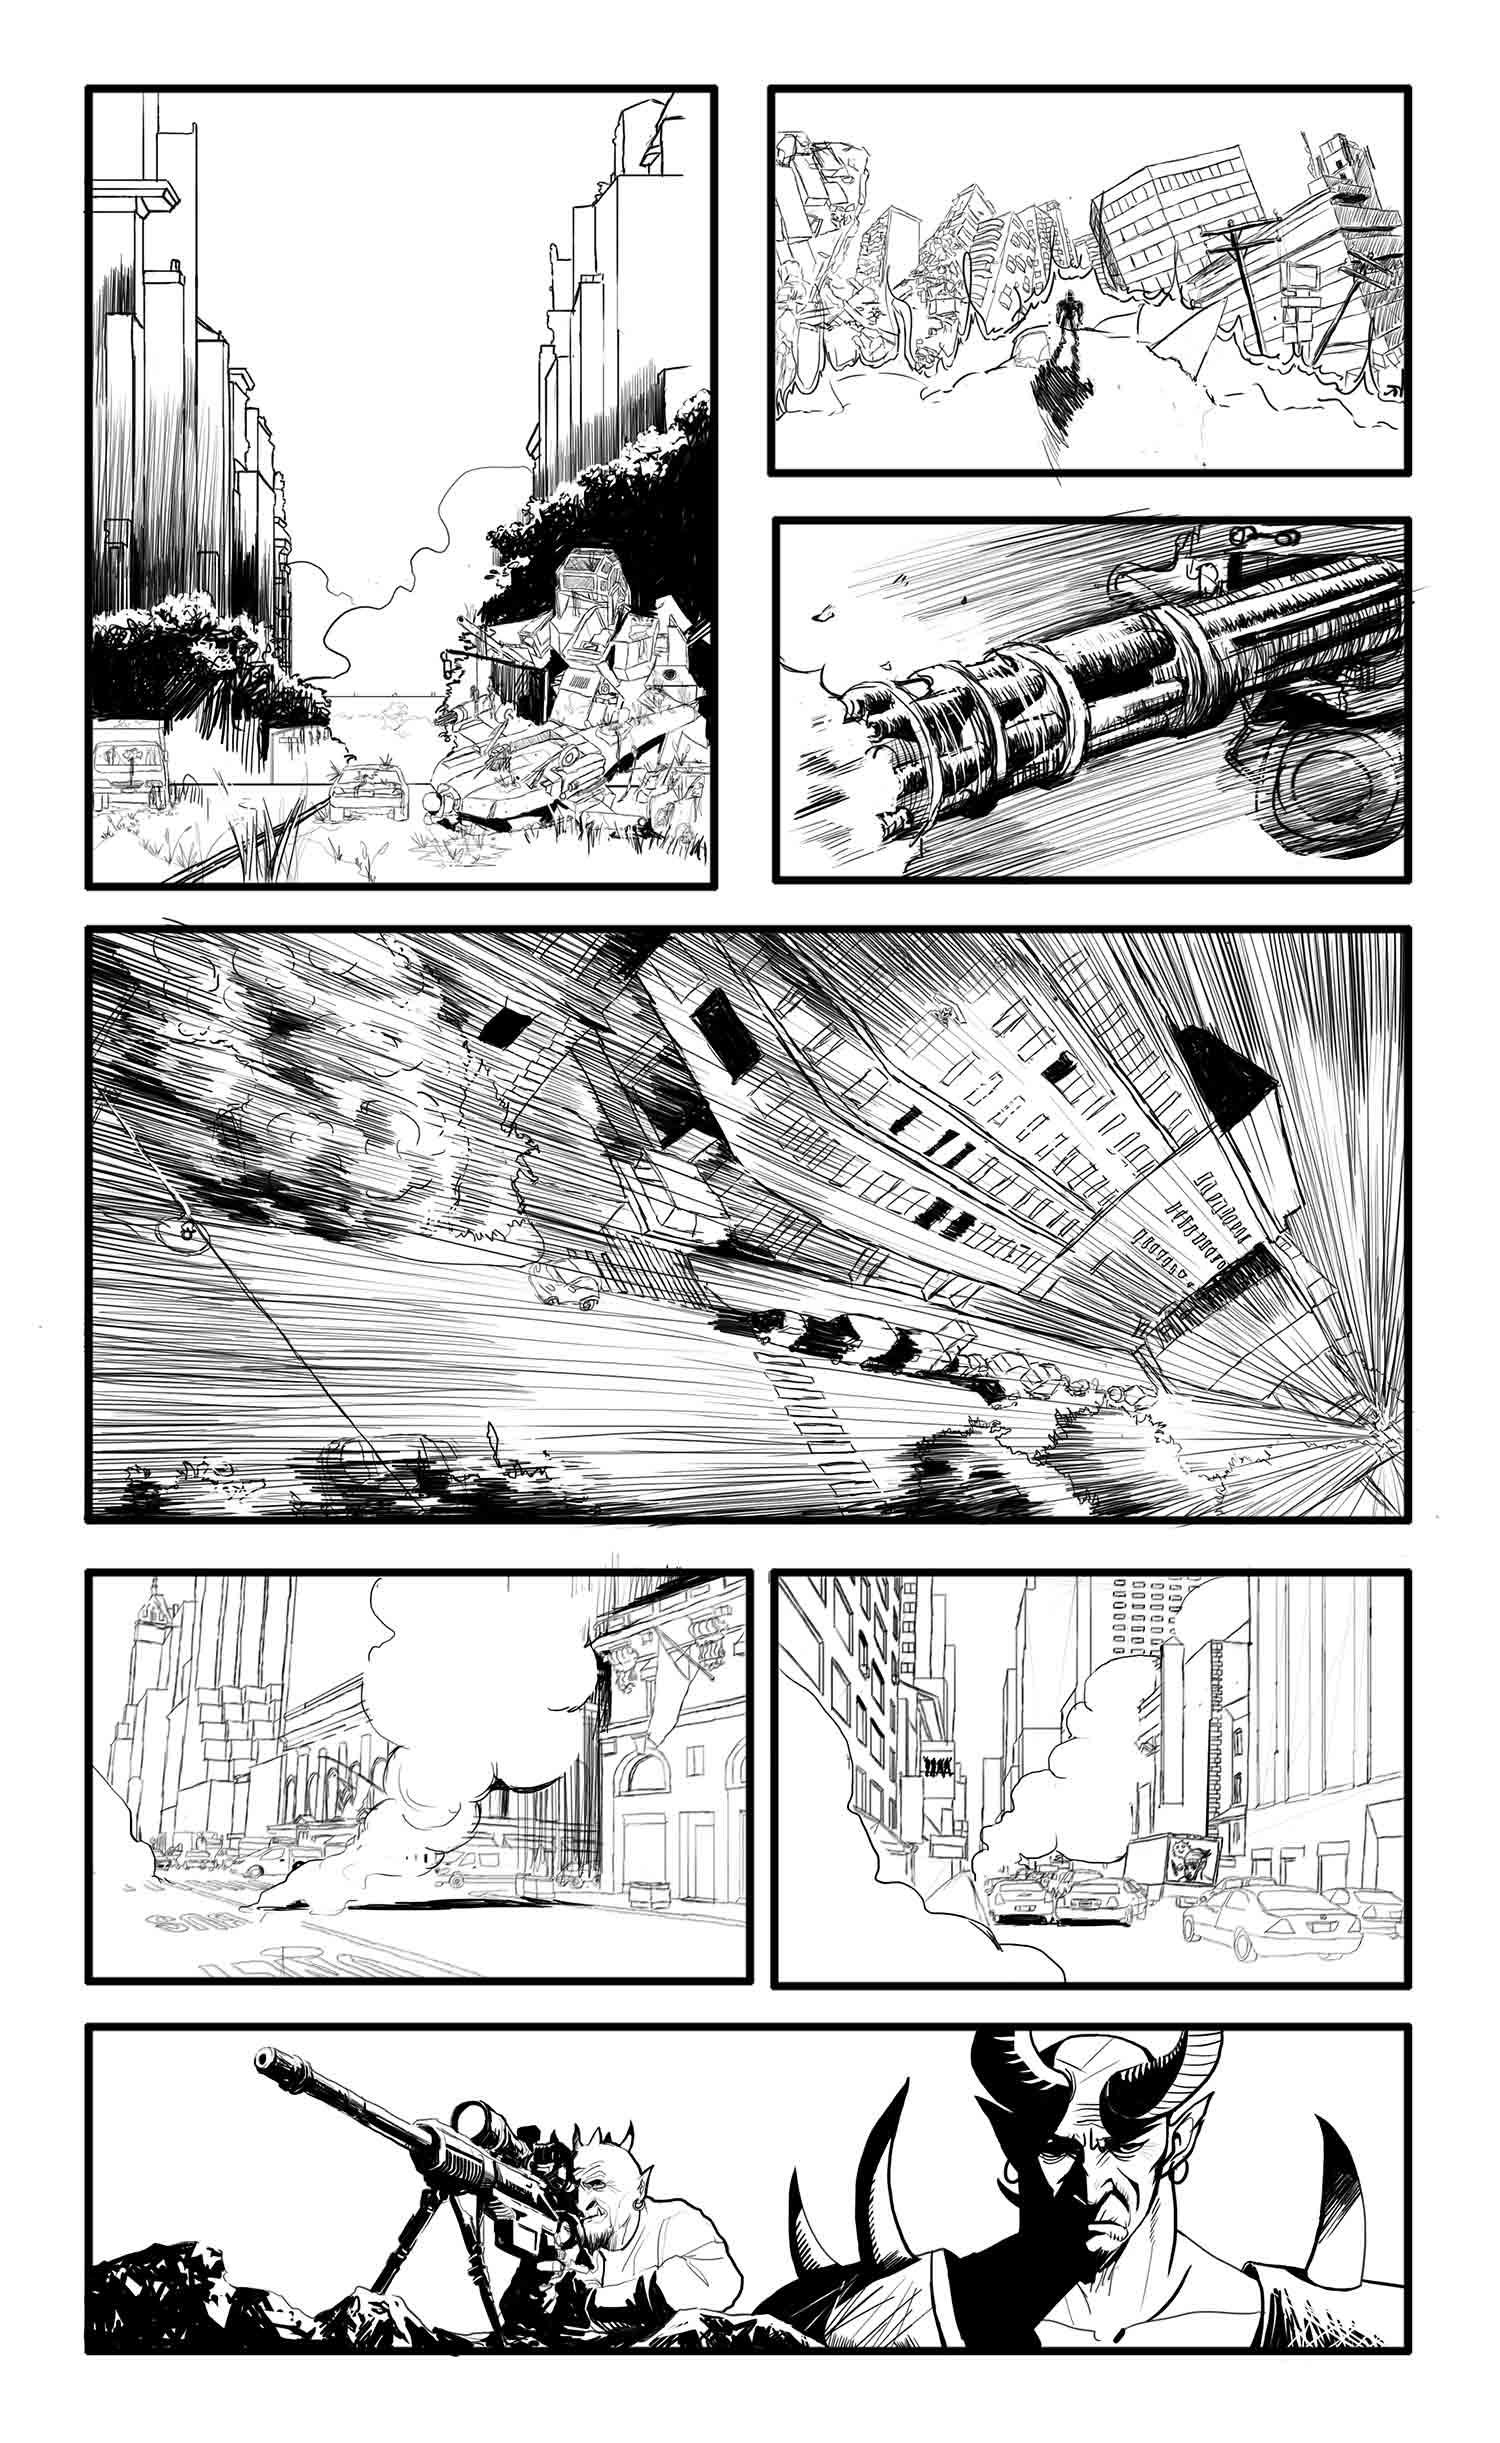 ashcan-digital-course-comic-portfolio-prep-works-15-v01-2018-08.jpg